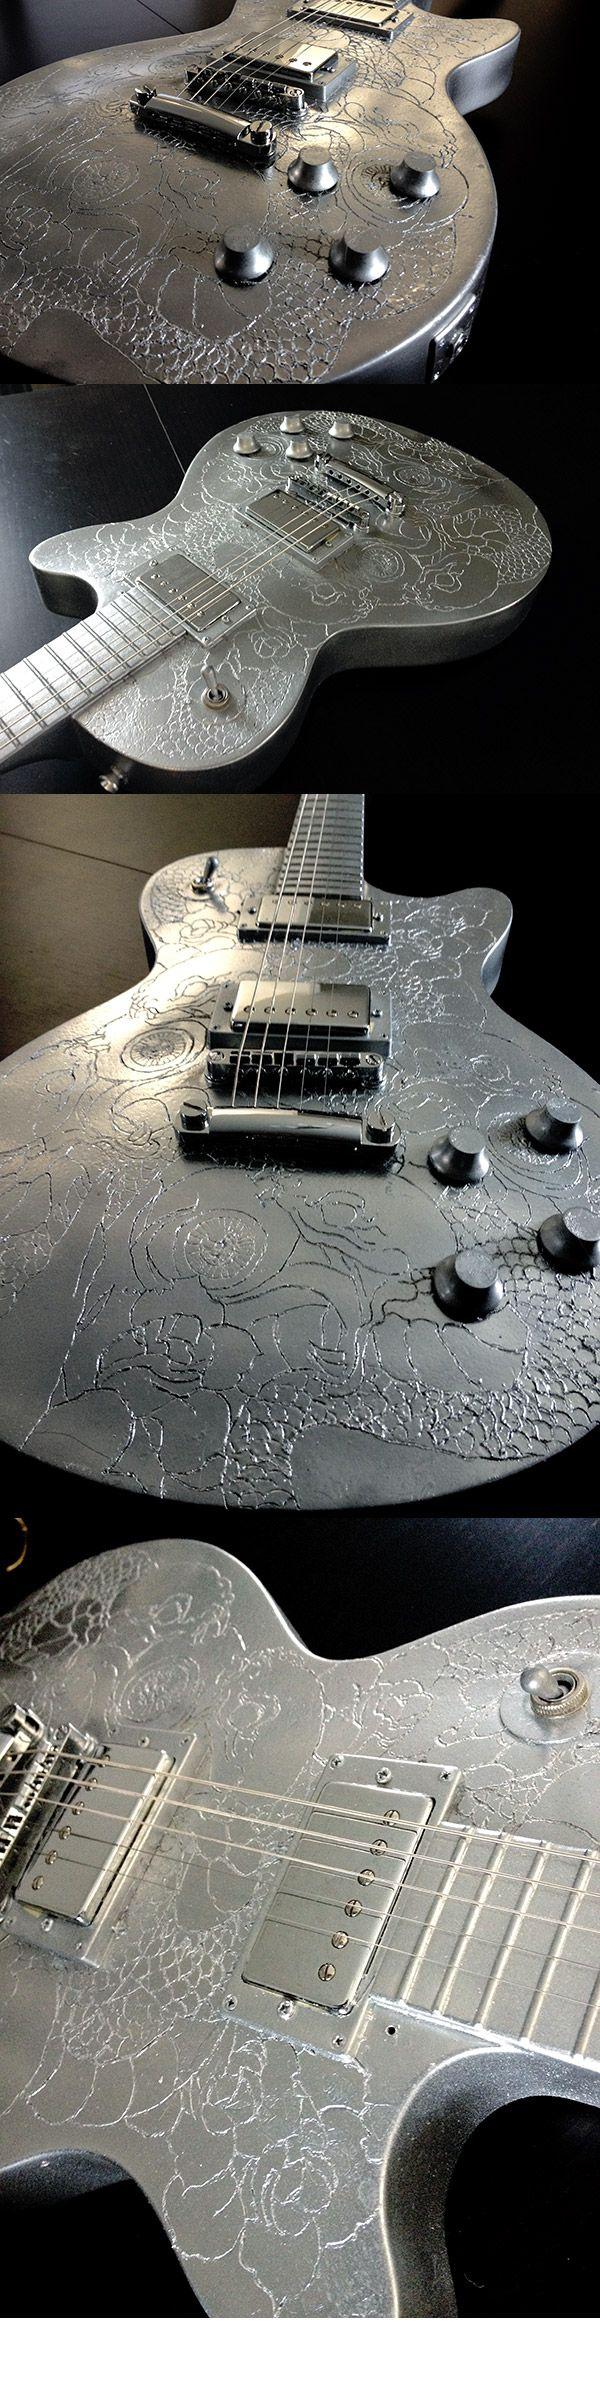 Teasing nouvelle guitare customisée